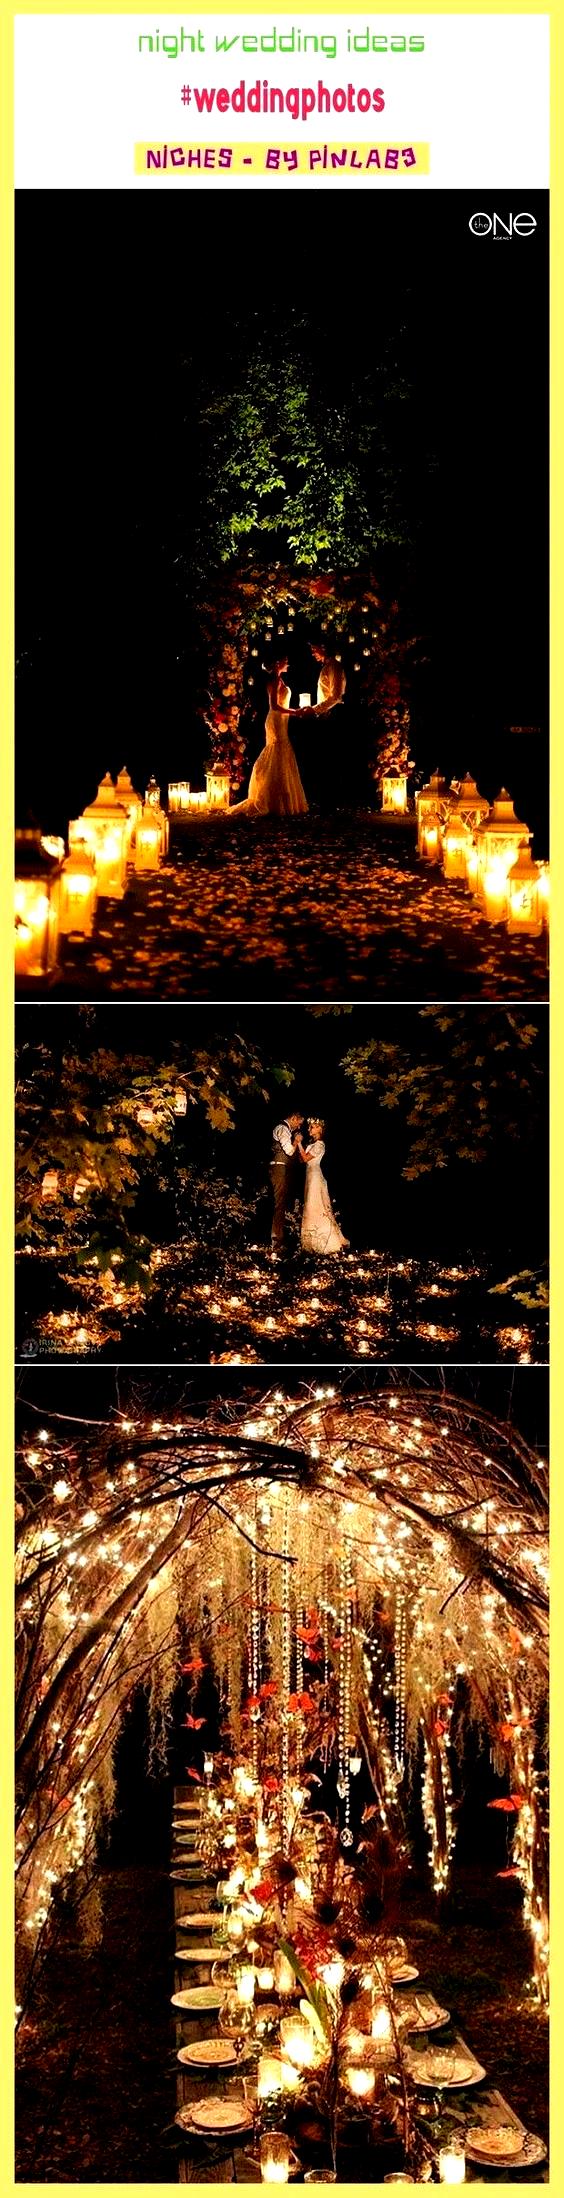 Night wedding ideas ées Nacht Hochzeitsideen  idées de mariage de nuit  ideas de la boda de noche  wedding ideas on a budget wedding ideas fall wedding idea...